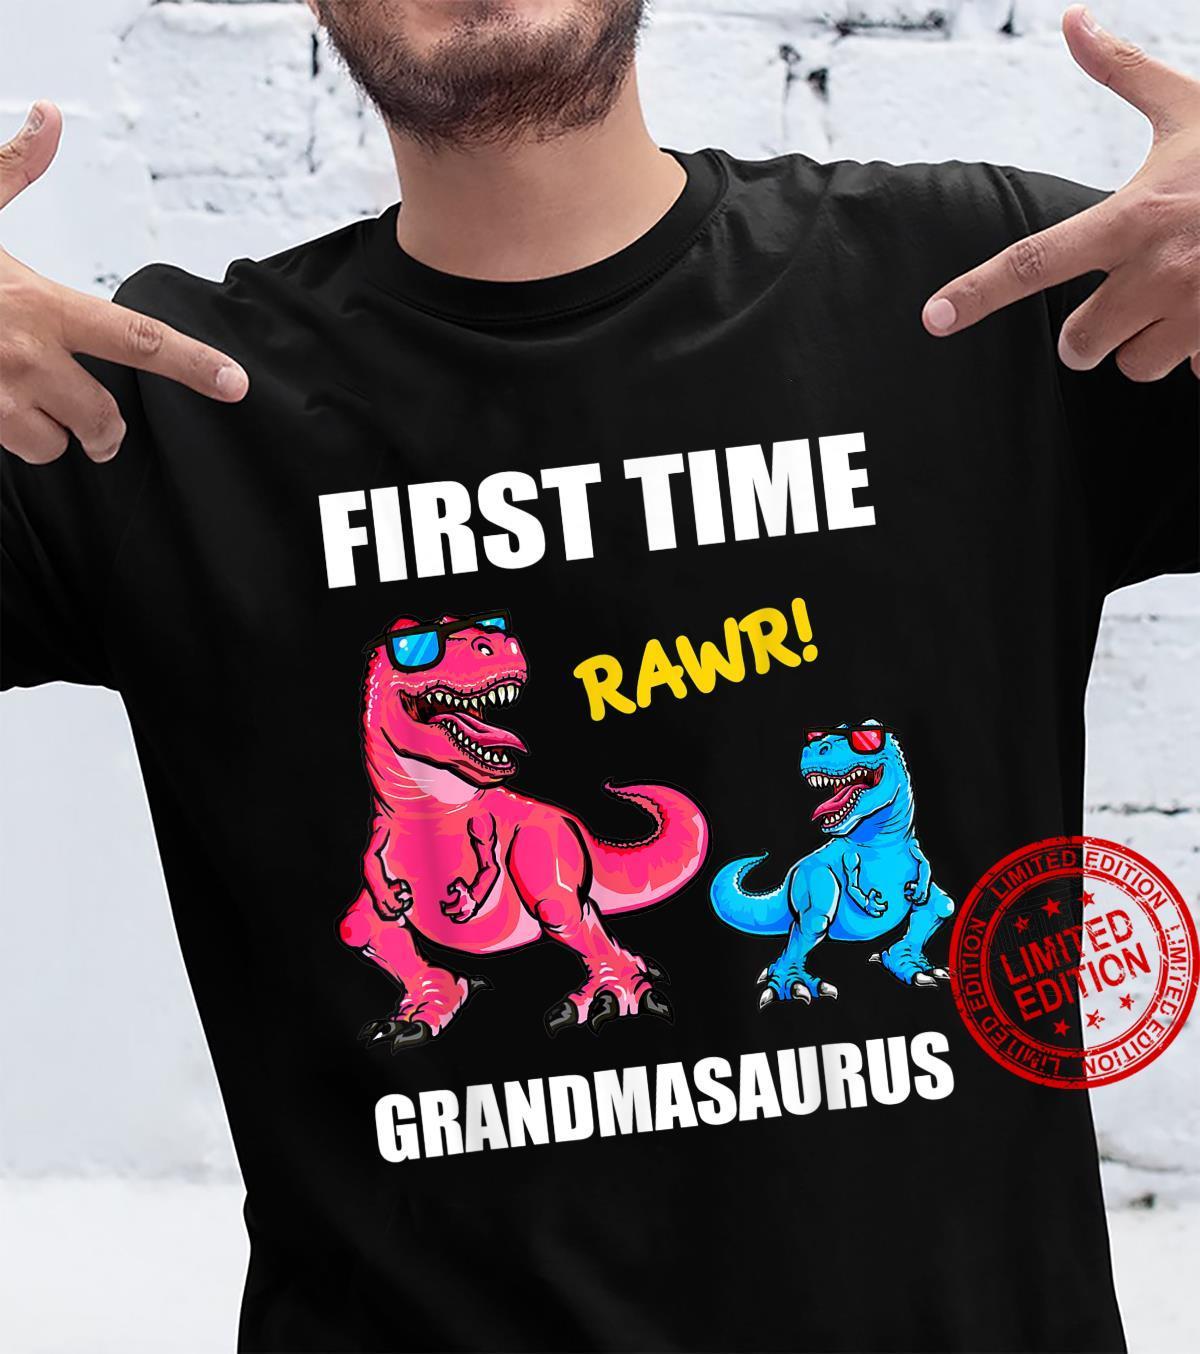 First Time Grandma 2022 Shirt, TRex Promoted To Grandma 2022 Shirt